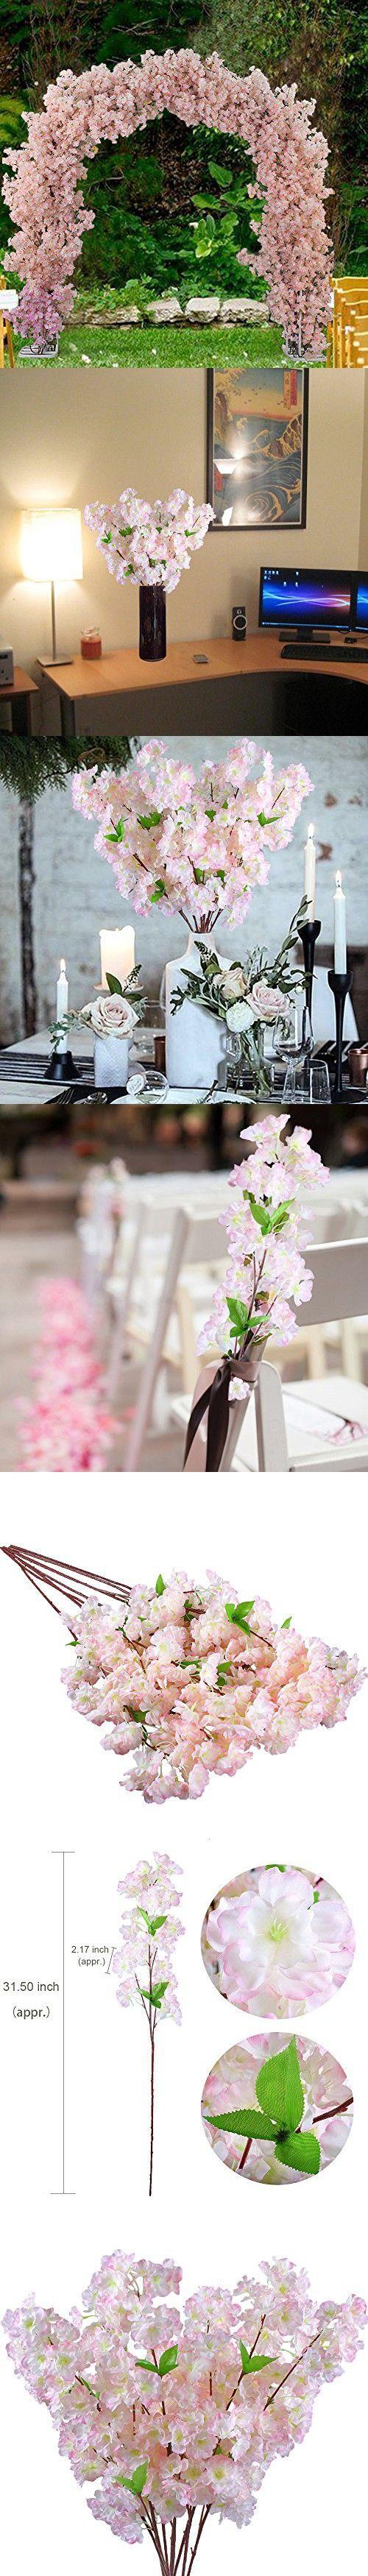 GTidea 31.5'' 8PCS Artificial Silk Spring Cherry Blossom Natural Looking Faux Long Stems Flowers Arrangements Home Kitchen Table Office Wedding Centerpieces Decor Light Pink